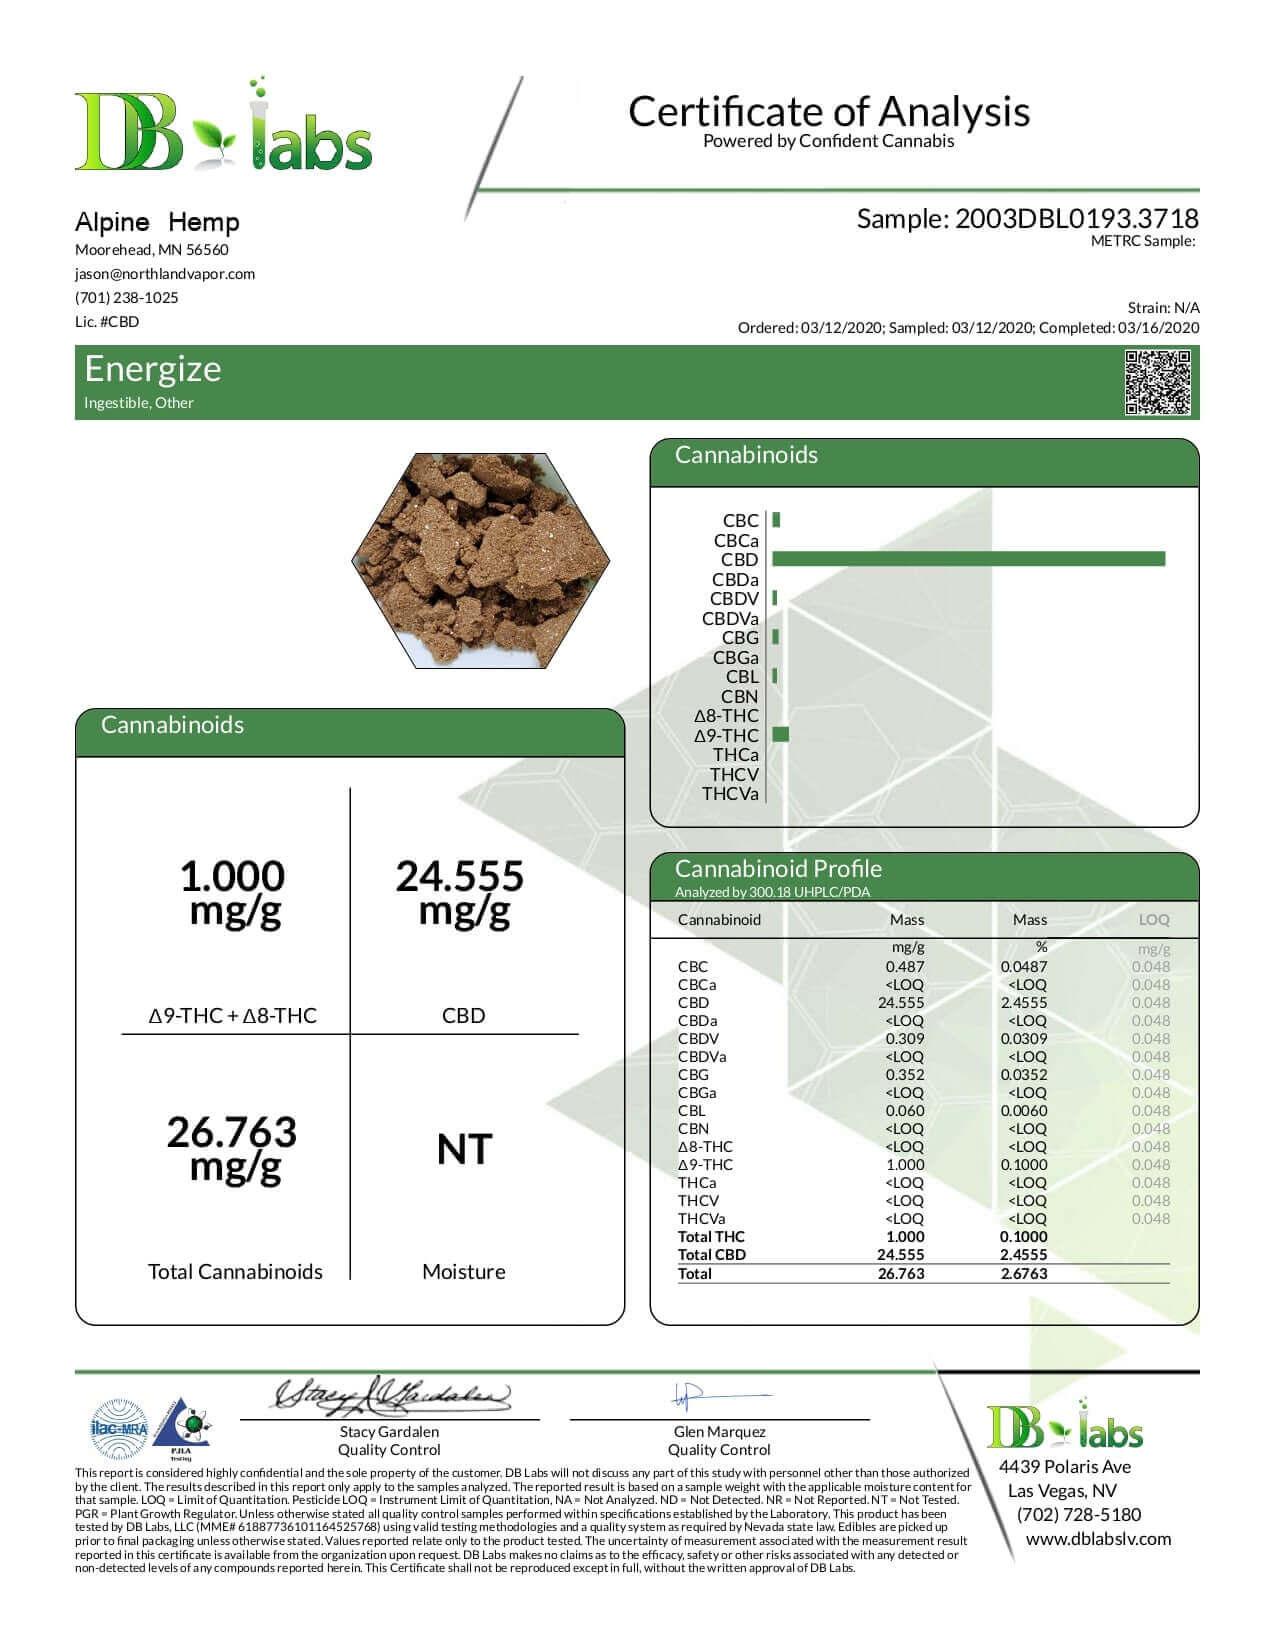 Alpine Hemp CBD Capsule Energize Lab Report